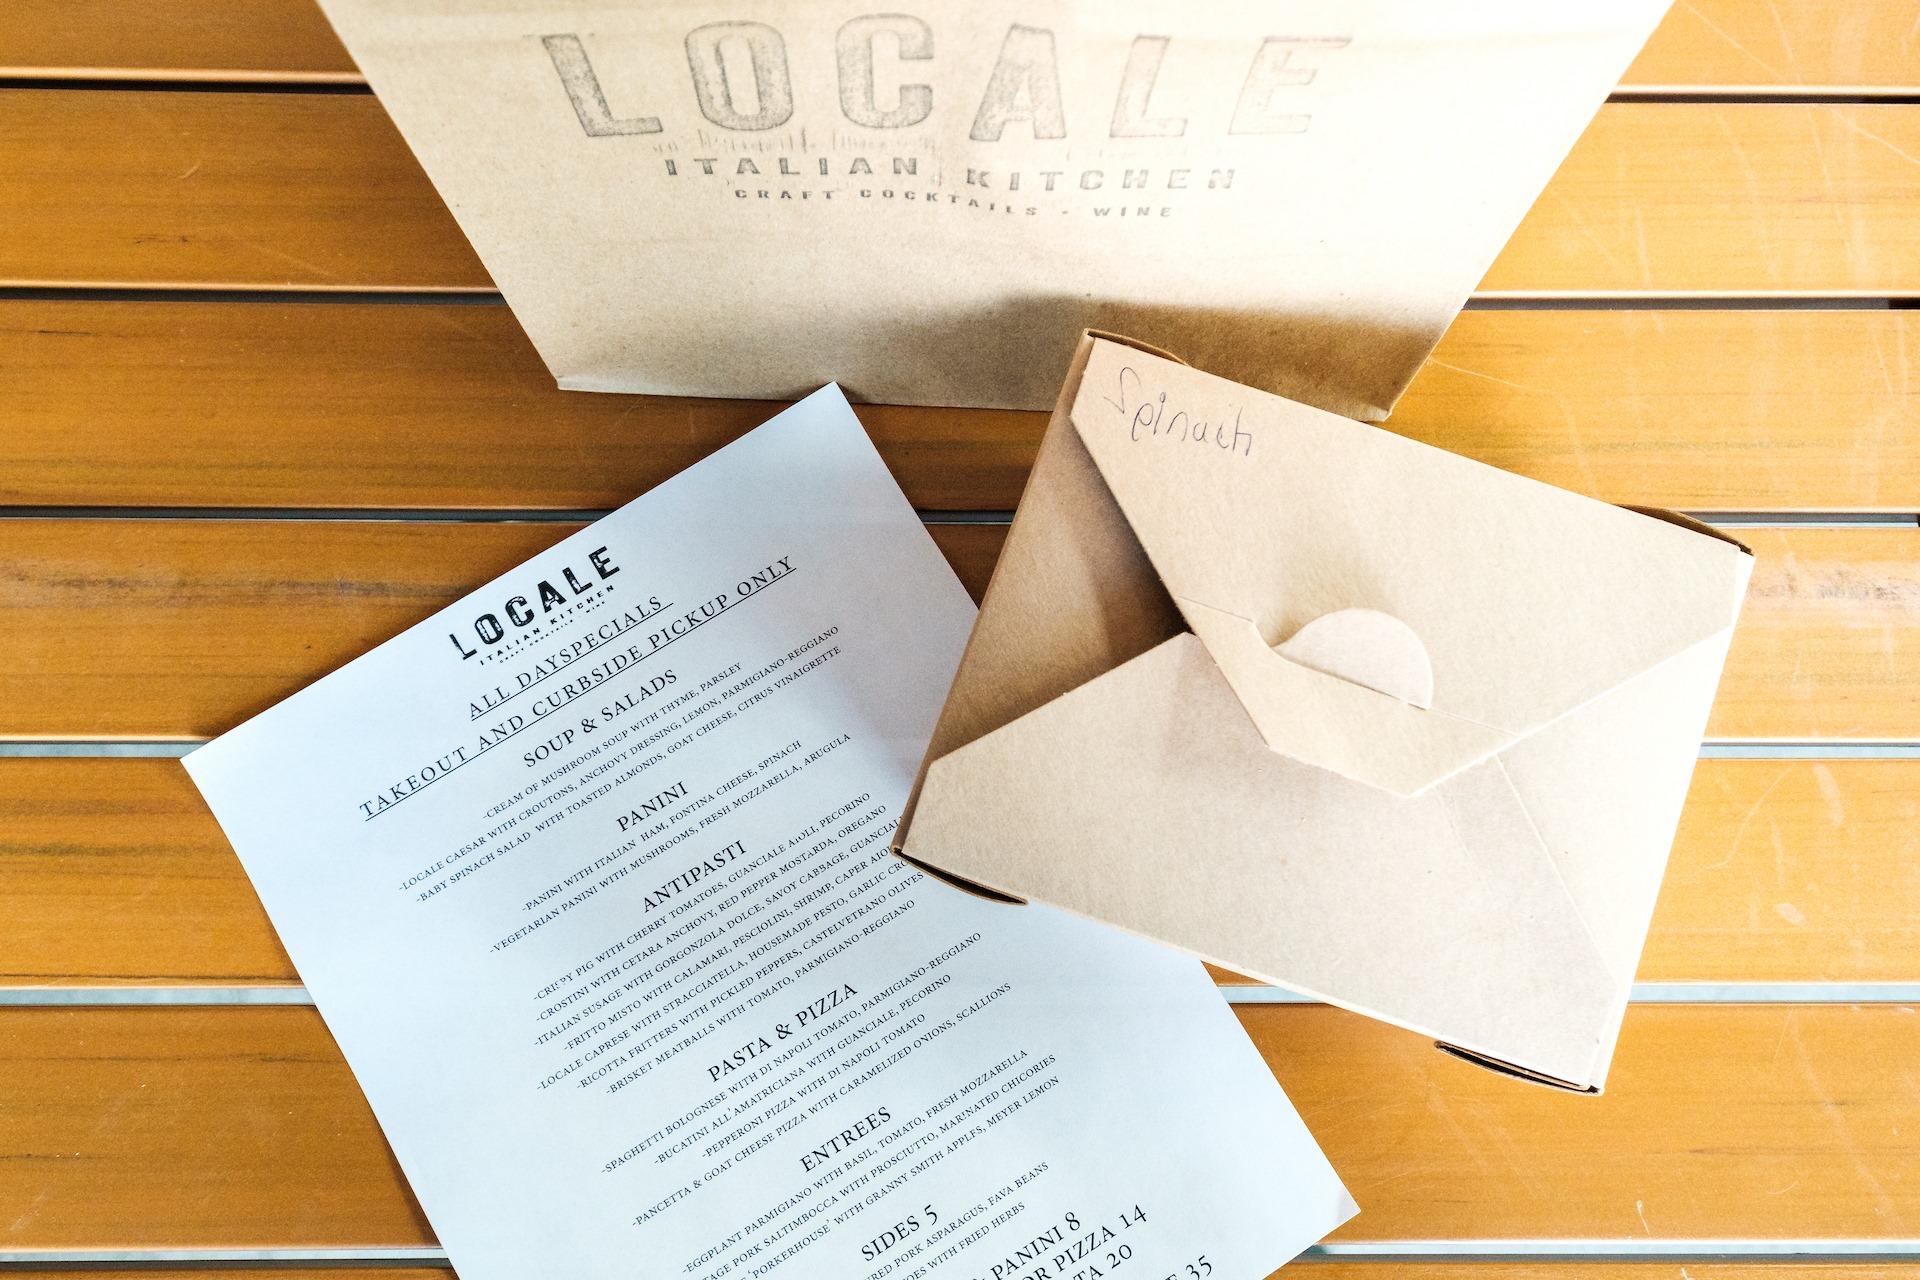 A bag, menu, and takeout box